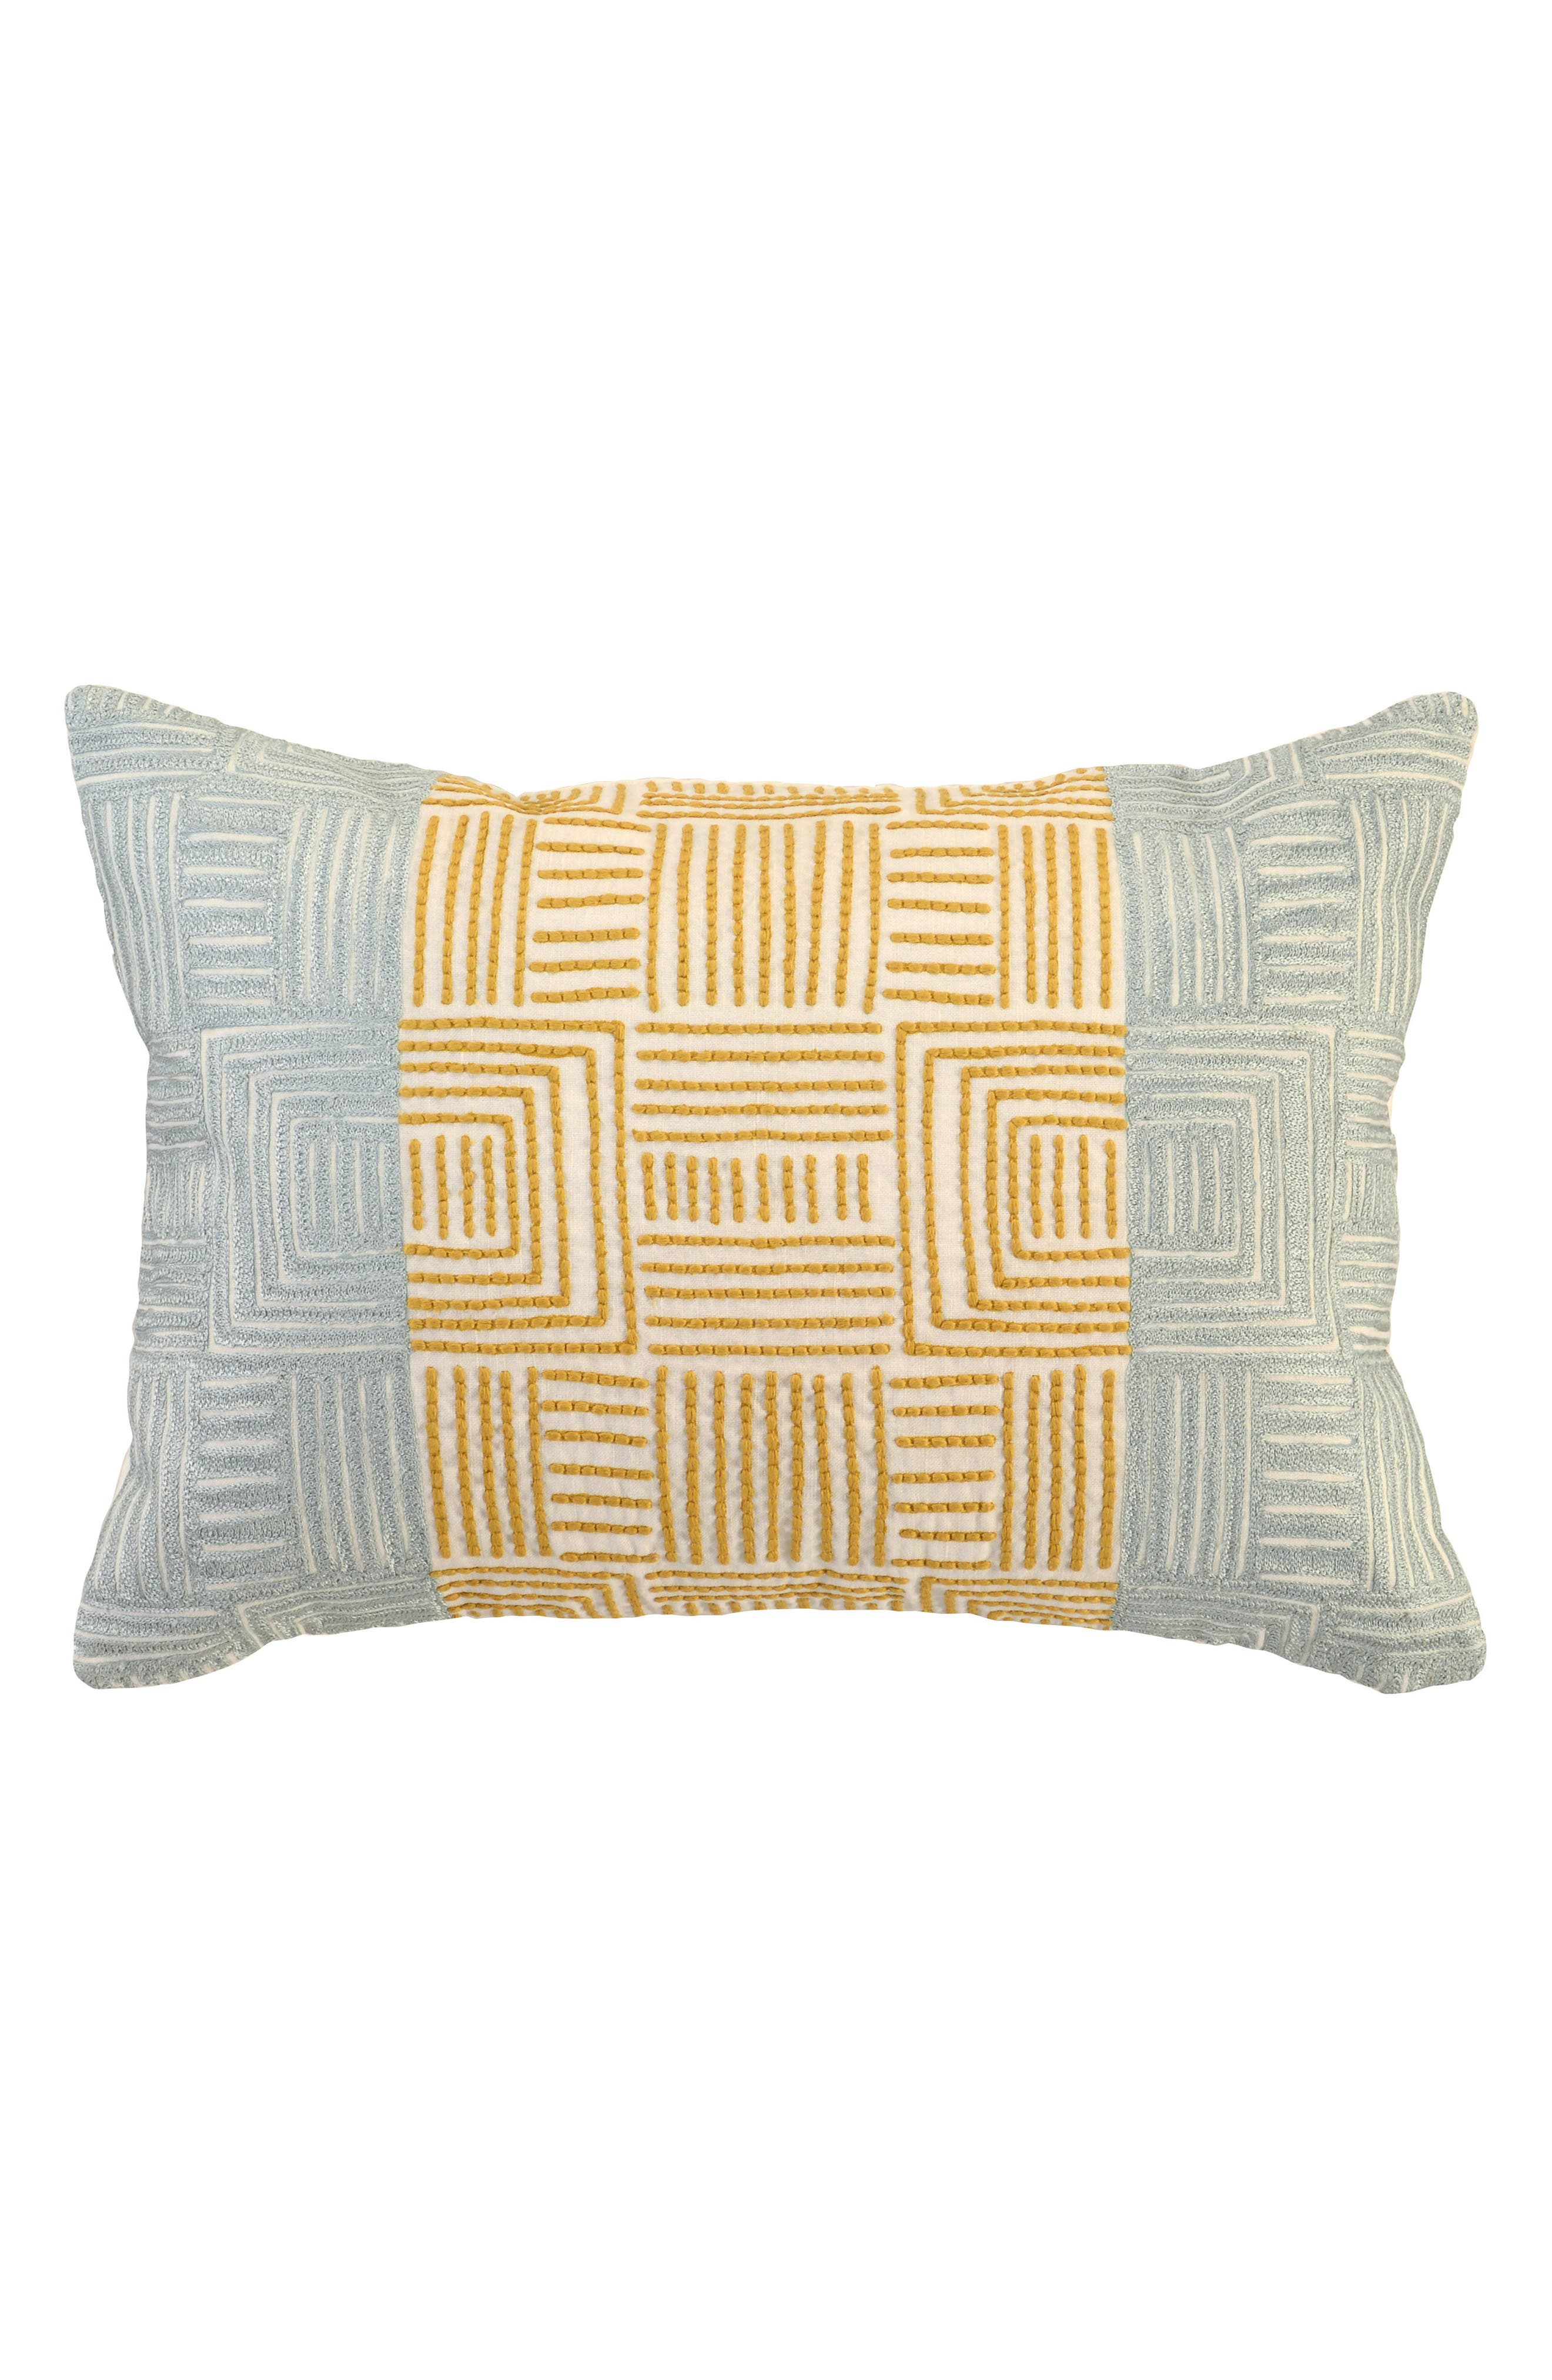 Dixon Ocre Tidal Accent Pillow,                         Main,                         color, Seaglass/ Yellow